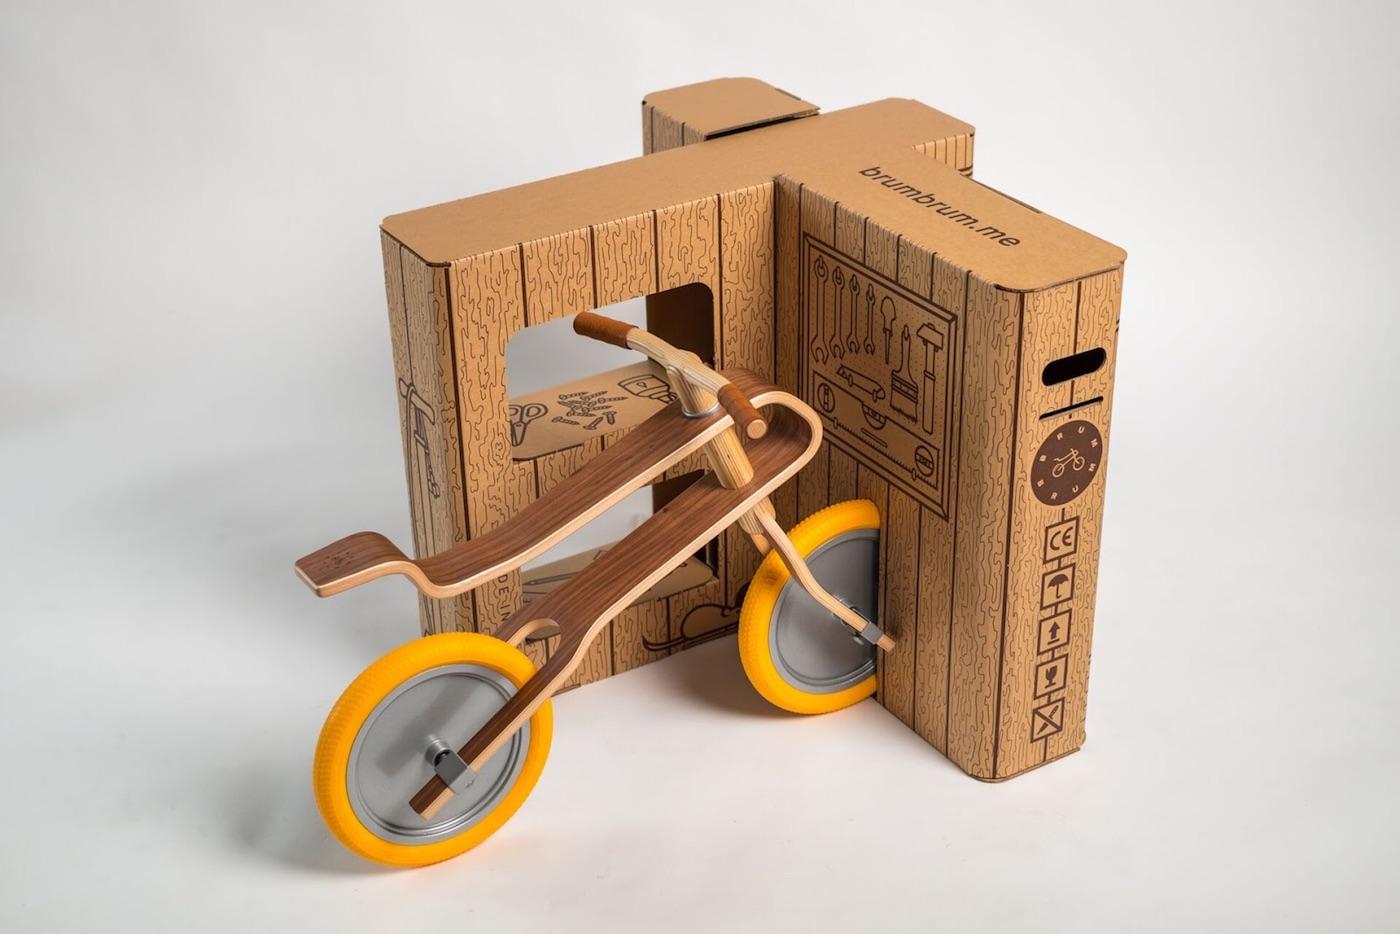 Cool packaging brum box playhouse midland paper for Industrial design packaging